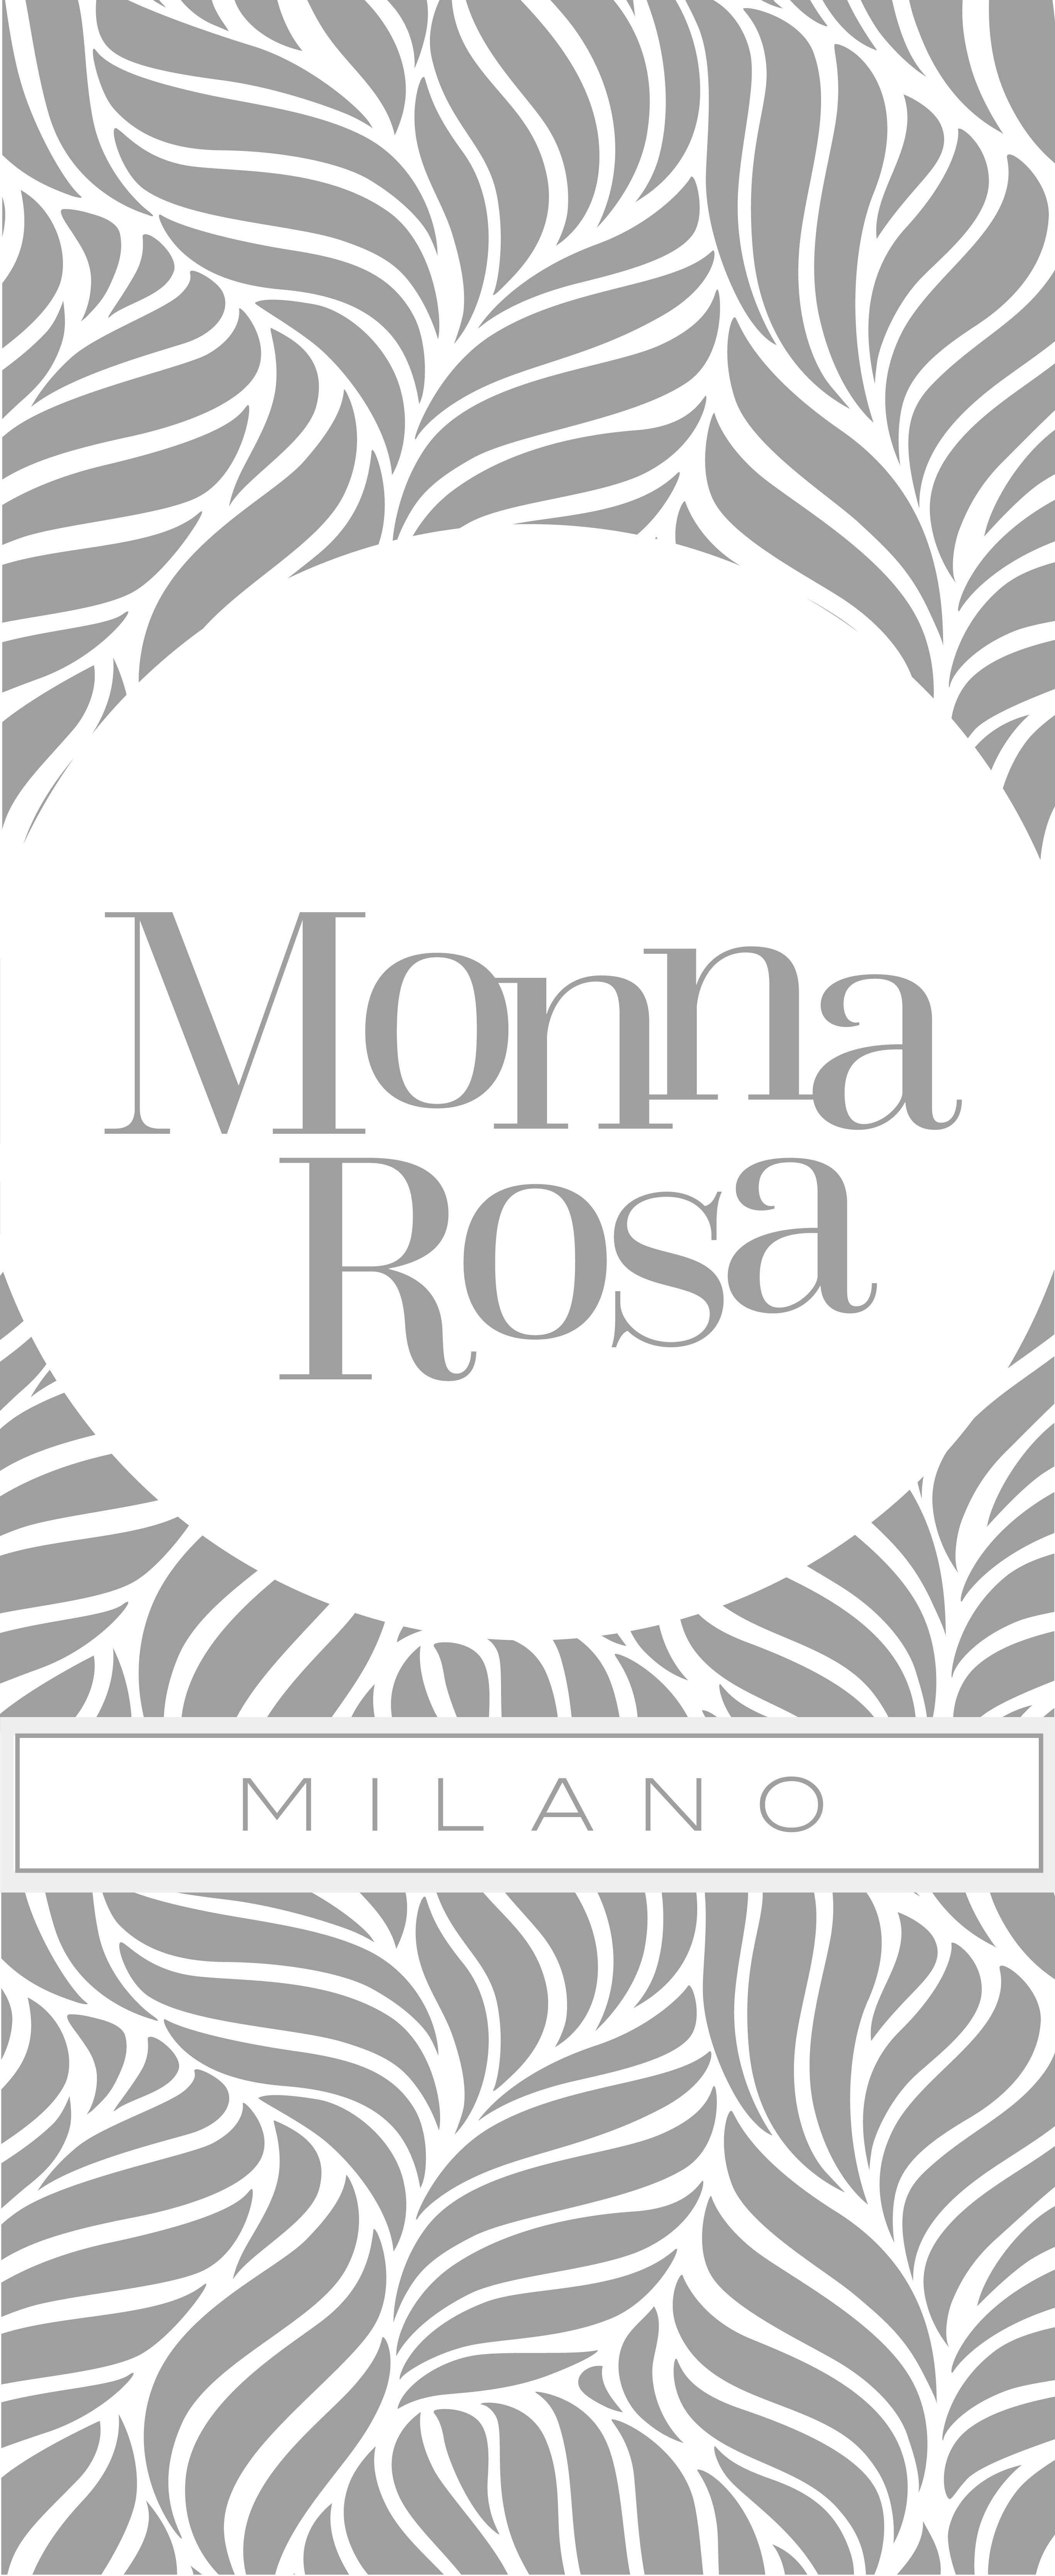 MonnaRoza Tekstil San. Tic. Ltd. Şti, Monna Rosa Milano